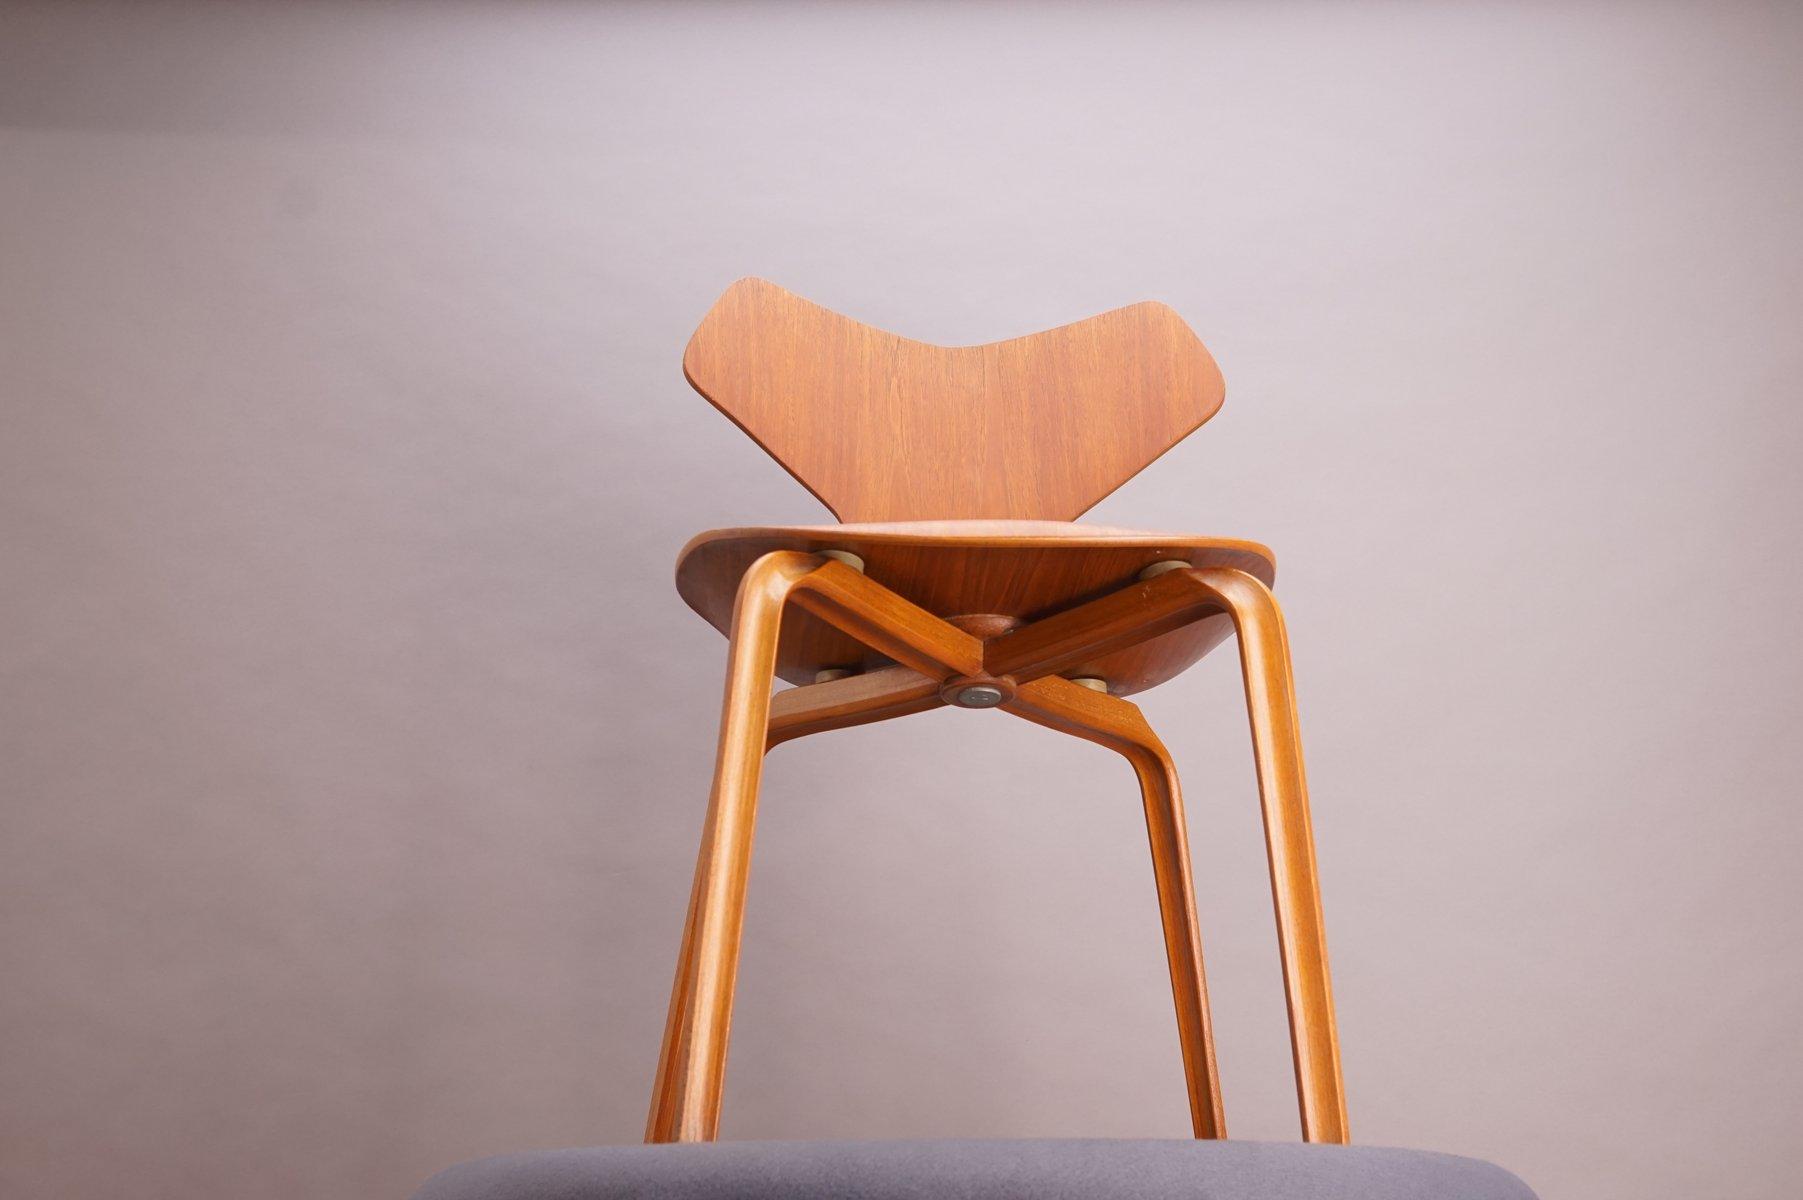 teak grand prix stuhl von arne jacobsen f r fritz hansen. Black Bedroom Furniture Sets. Home Design Ideas